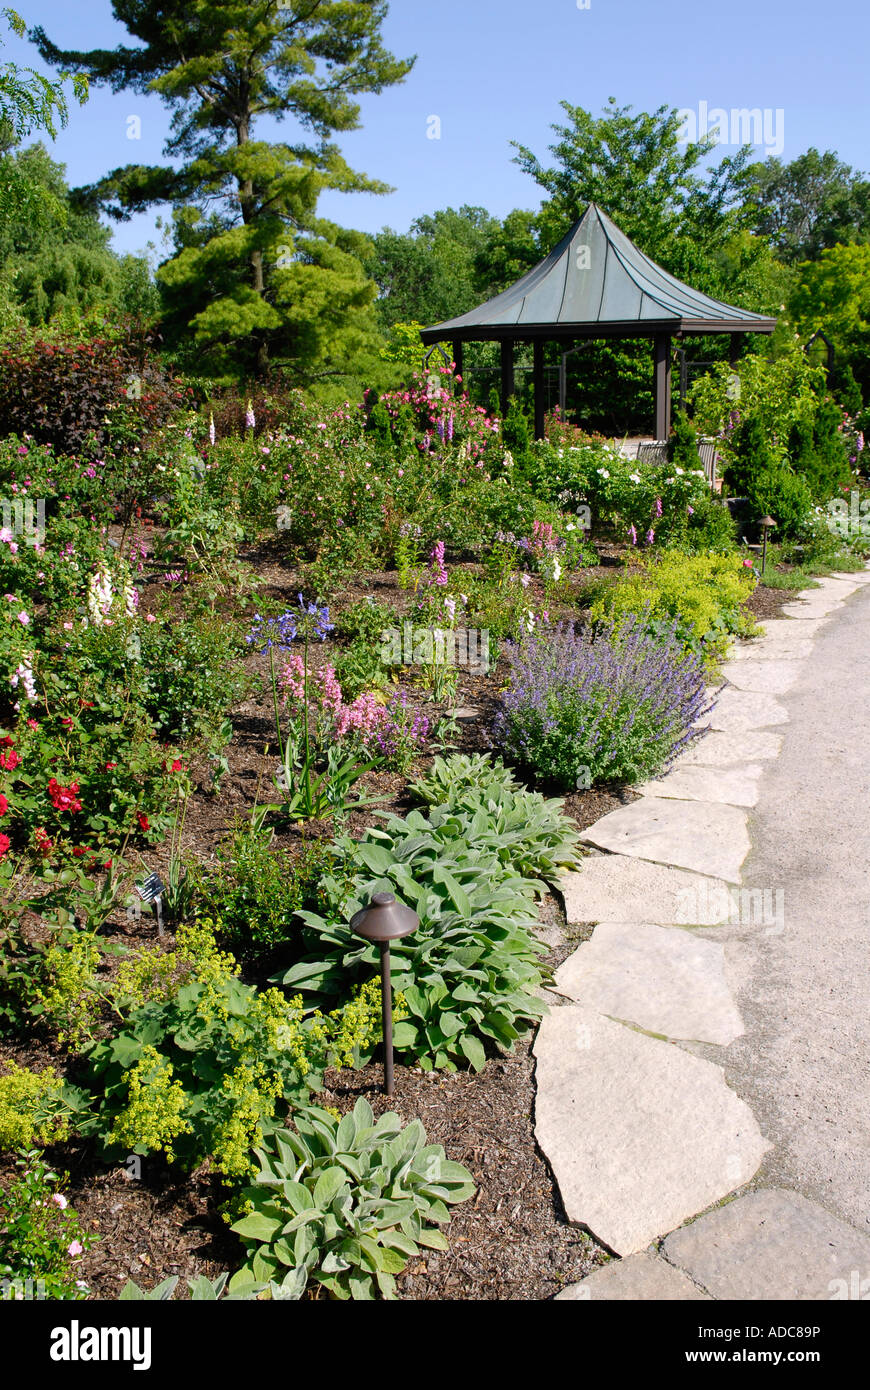 Olbrich Botanical Gardens In Madison Wisconsin Wi Usa Stock Photo Royalty Free Image 13374705